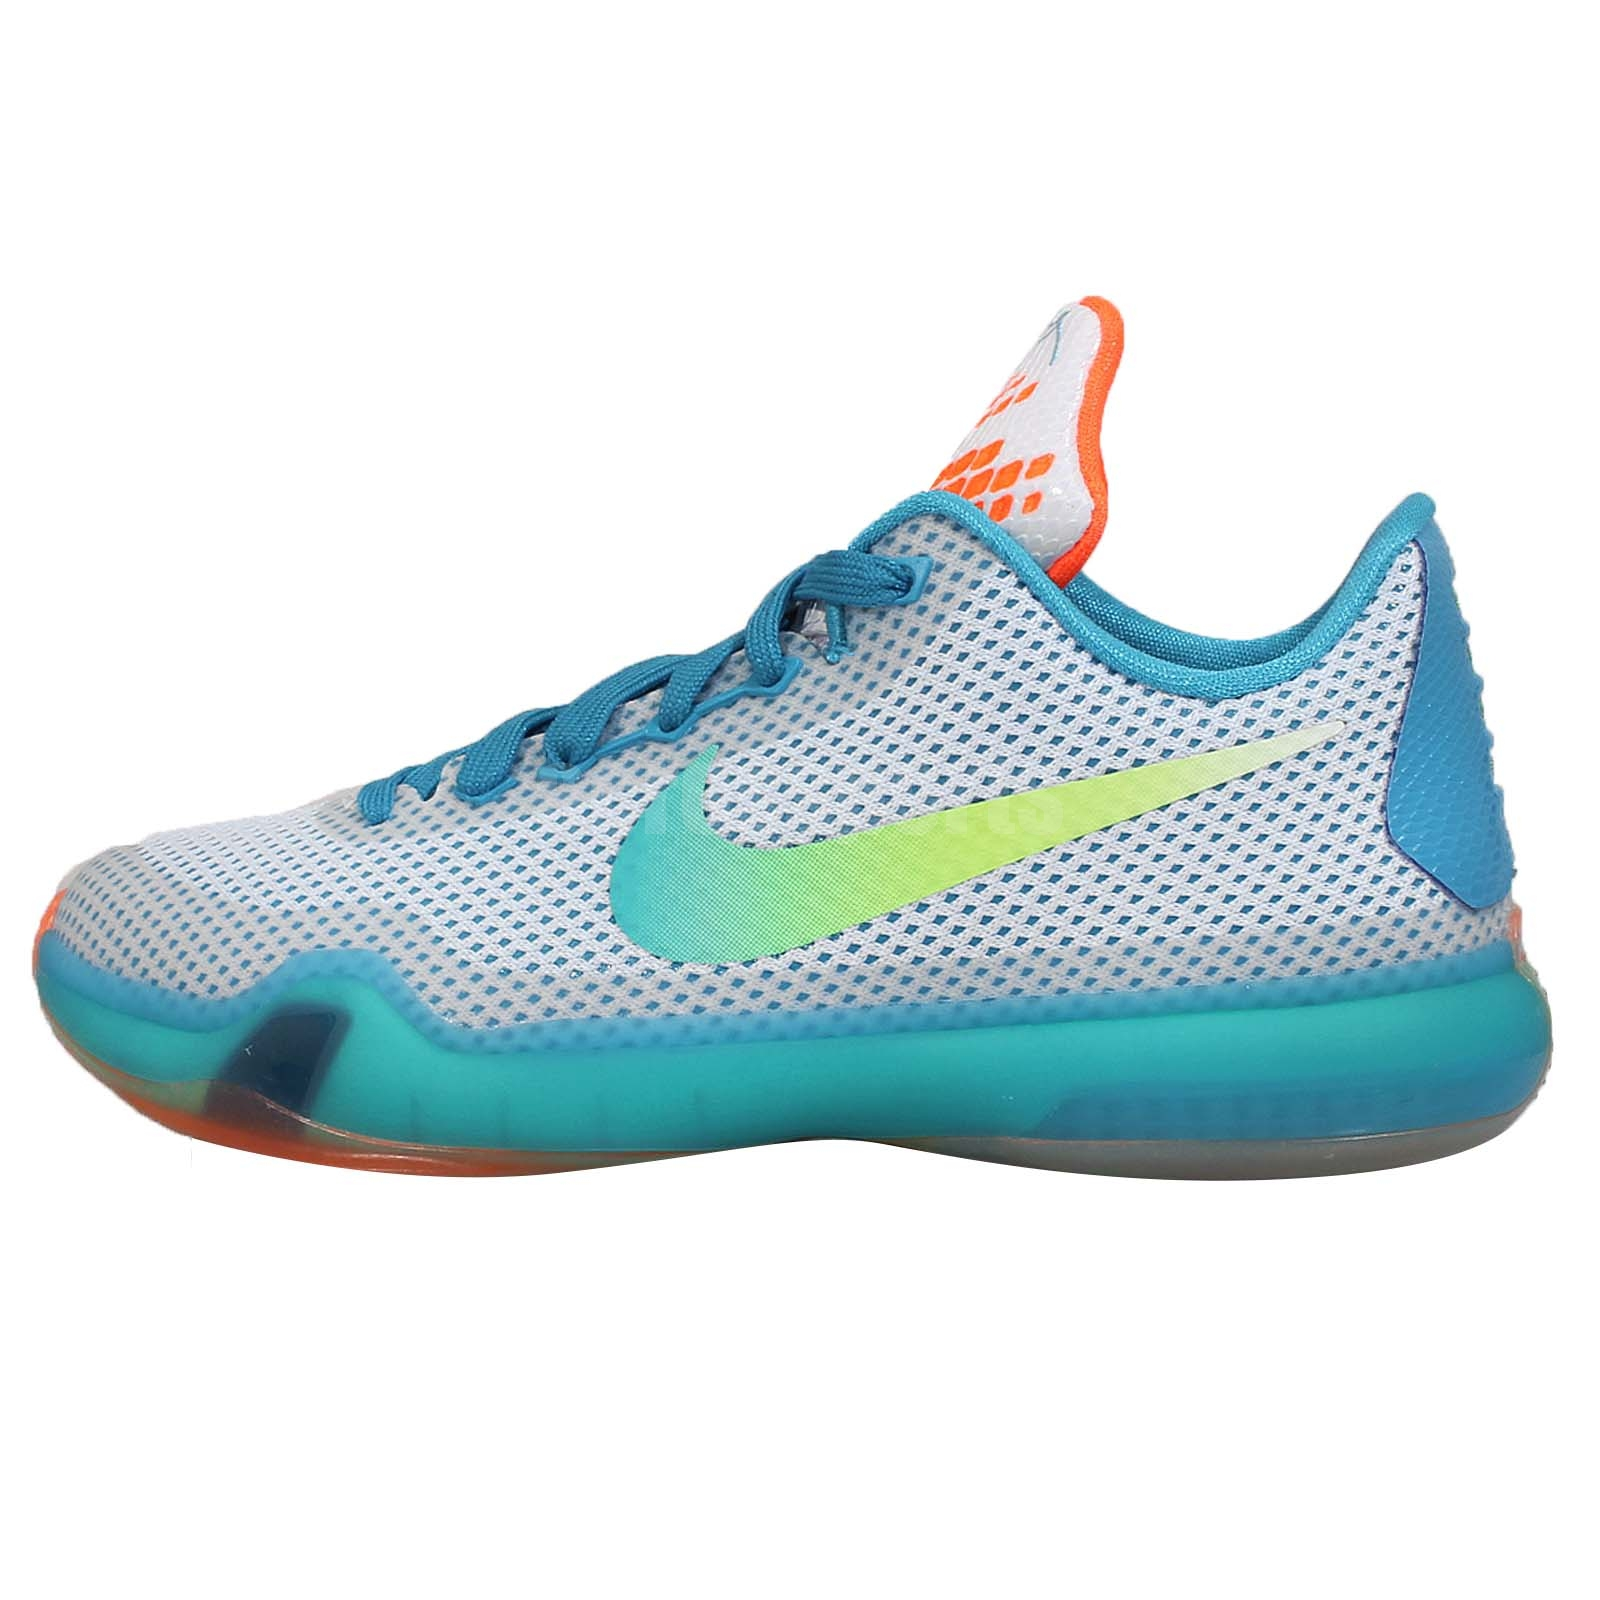 Kids Kobe Shoes